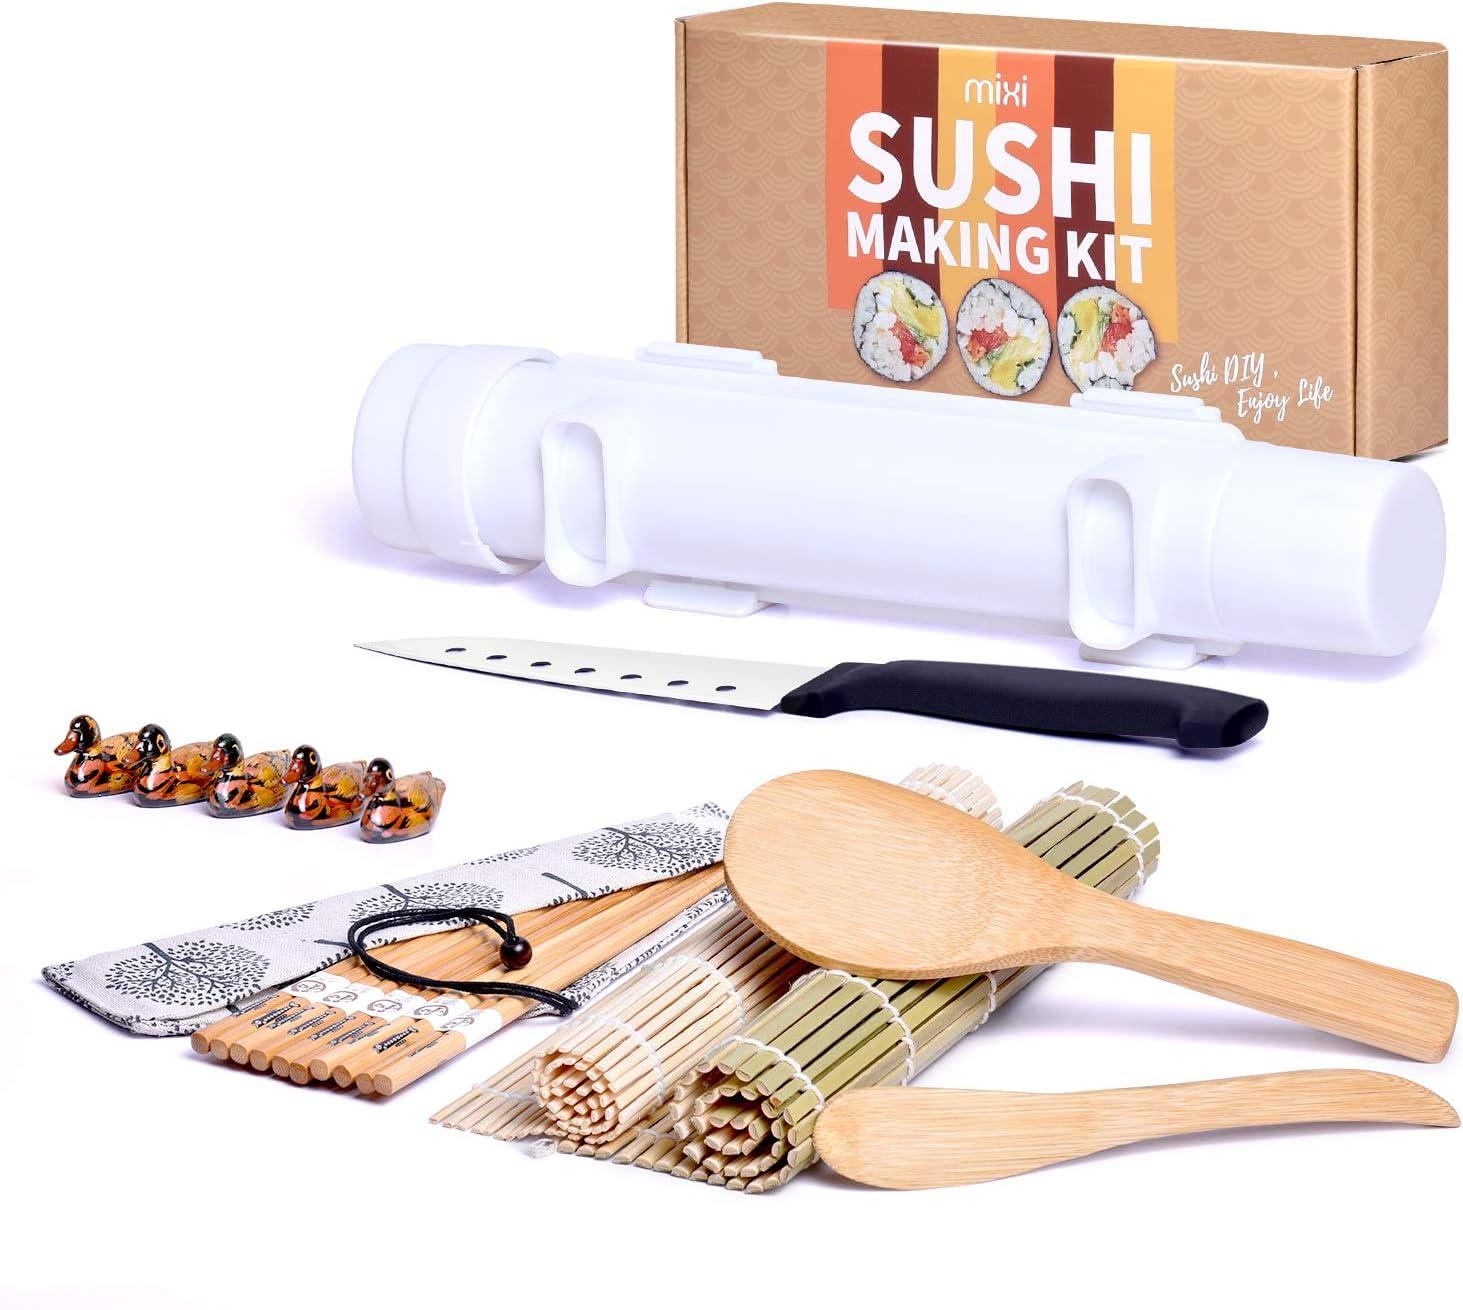 MIXI Sushi Making Kit, 17pcs Sushi Maker Set Include Sushi Mat, Sushi roller, Bamboo Chopsticks, Sushi Bazooka, Rice Paddle, Spreader, Sushi Knife, Holders, Cotton Bag, DIY Kitchen Set for Women Gifts